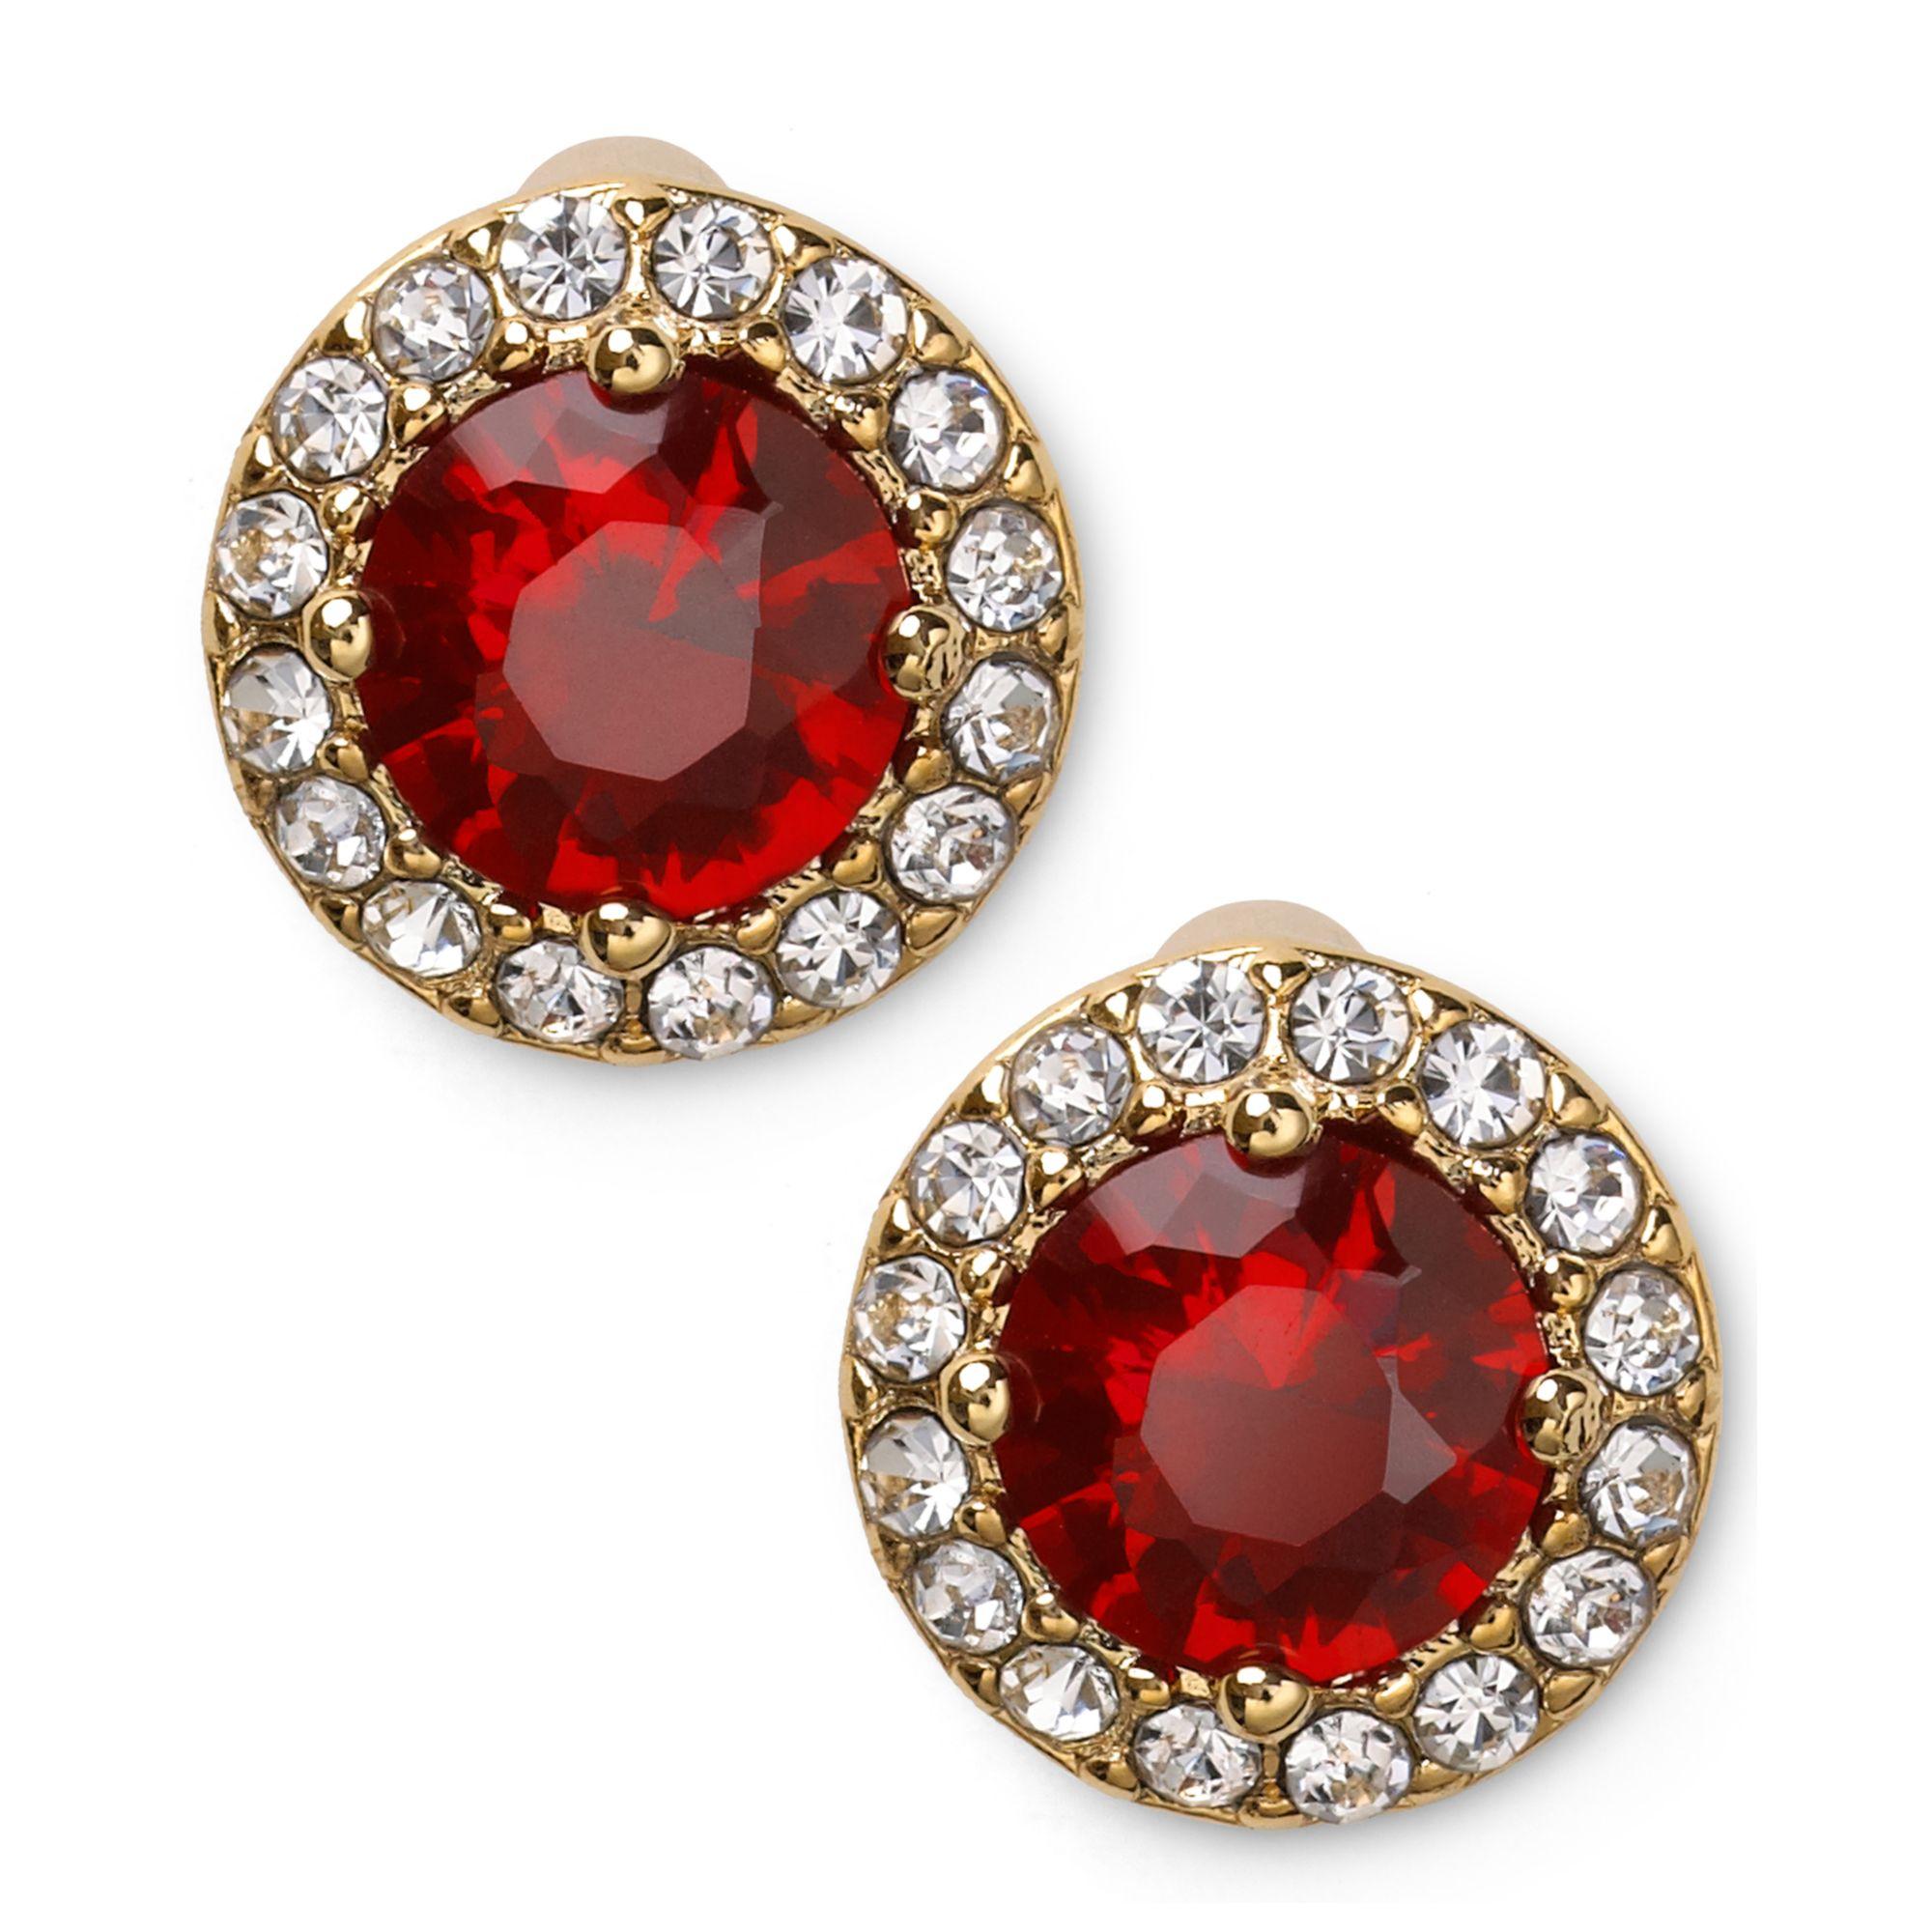 2116ec541 Red Stone Stud Earrings. Gallery. Lyst Lauren By Ralph 14k Goldplated Round  Faceted Gar